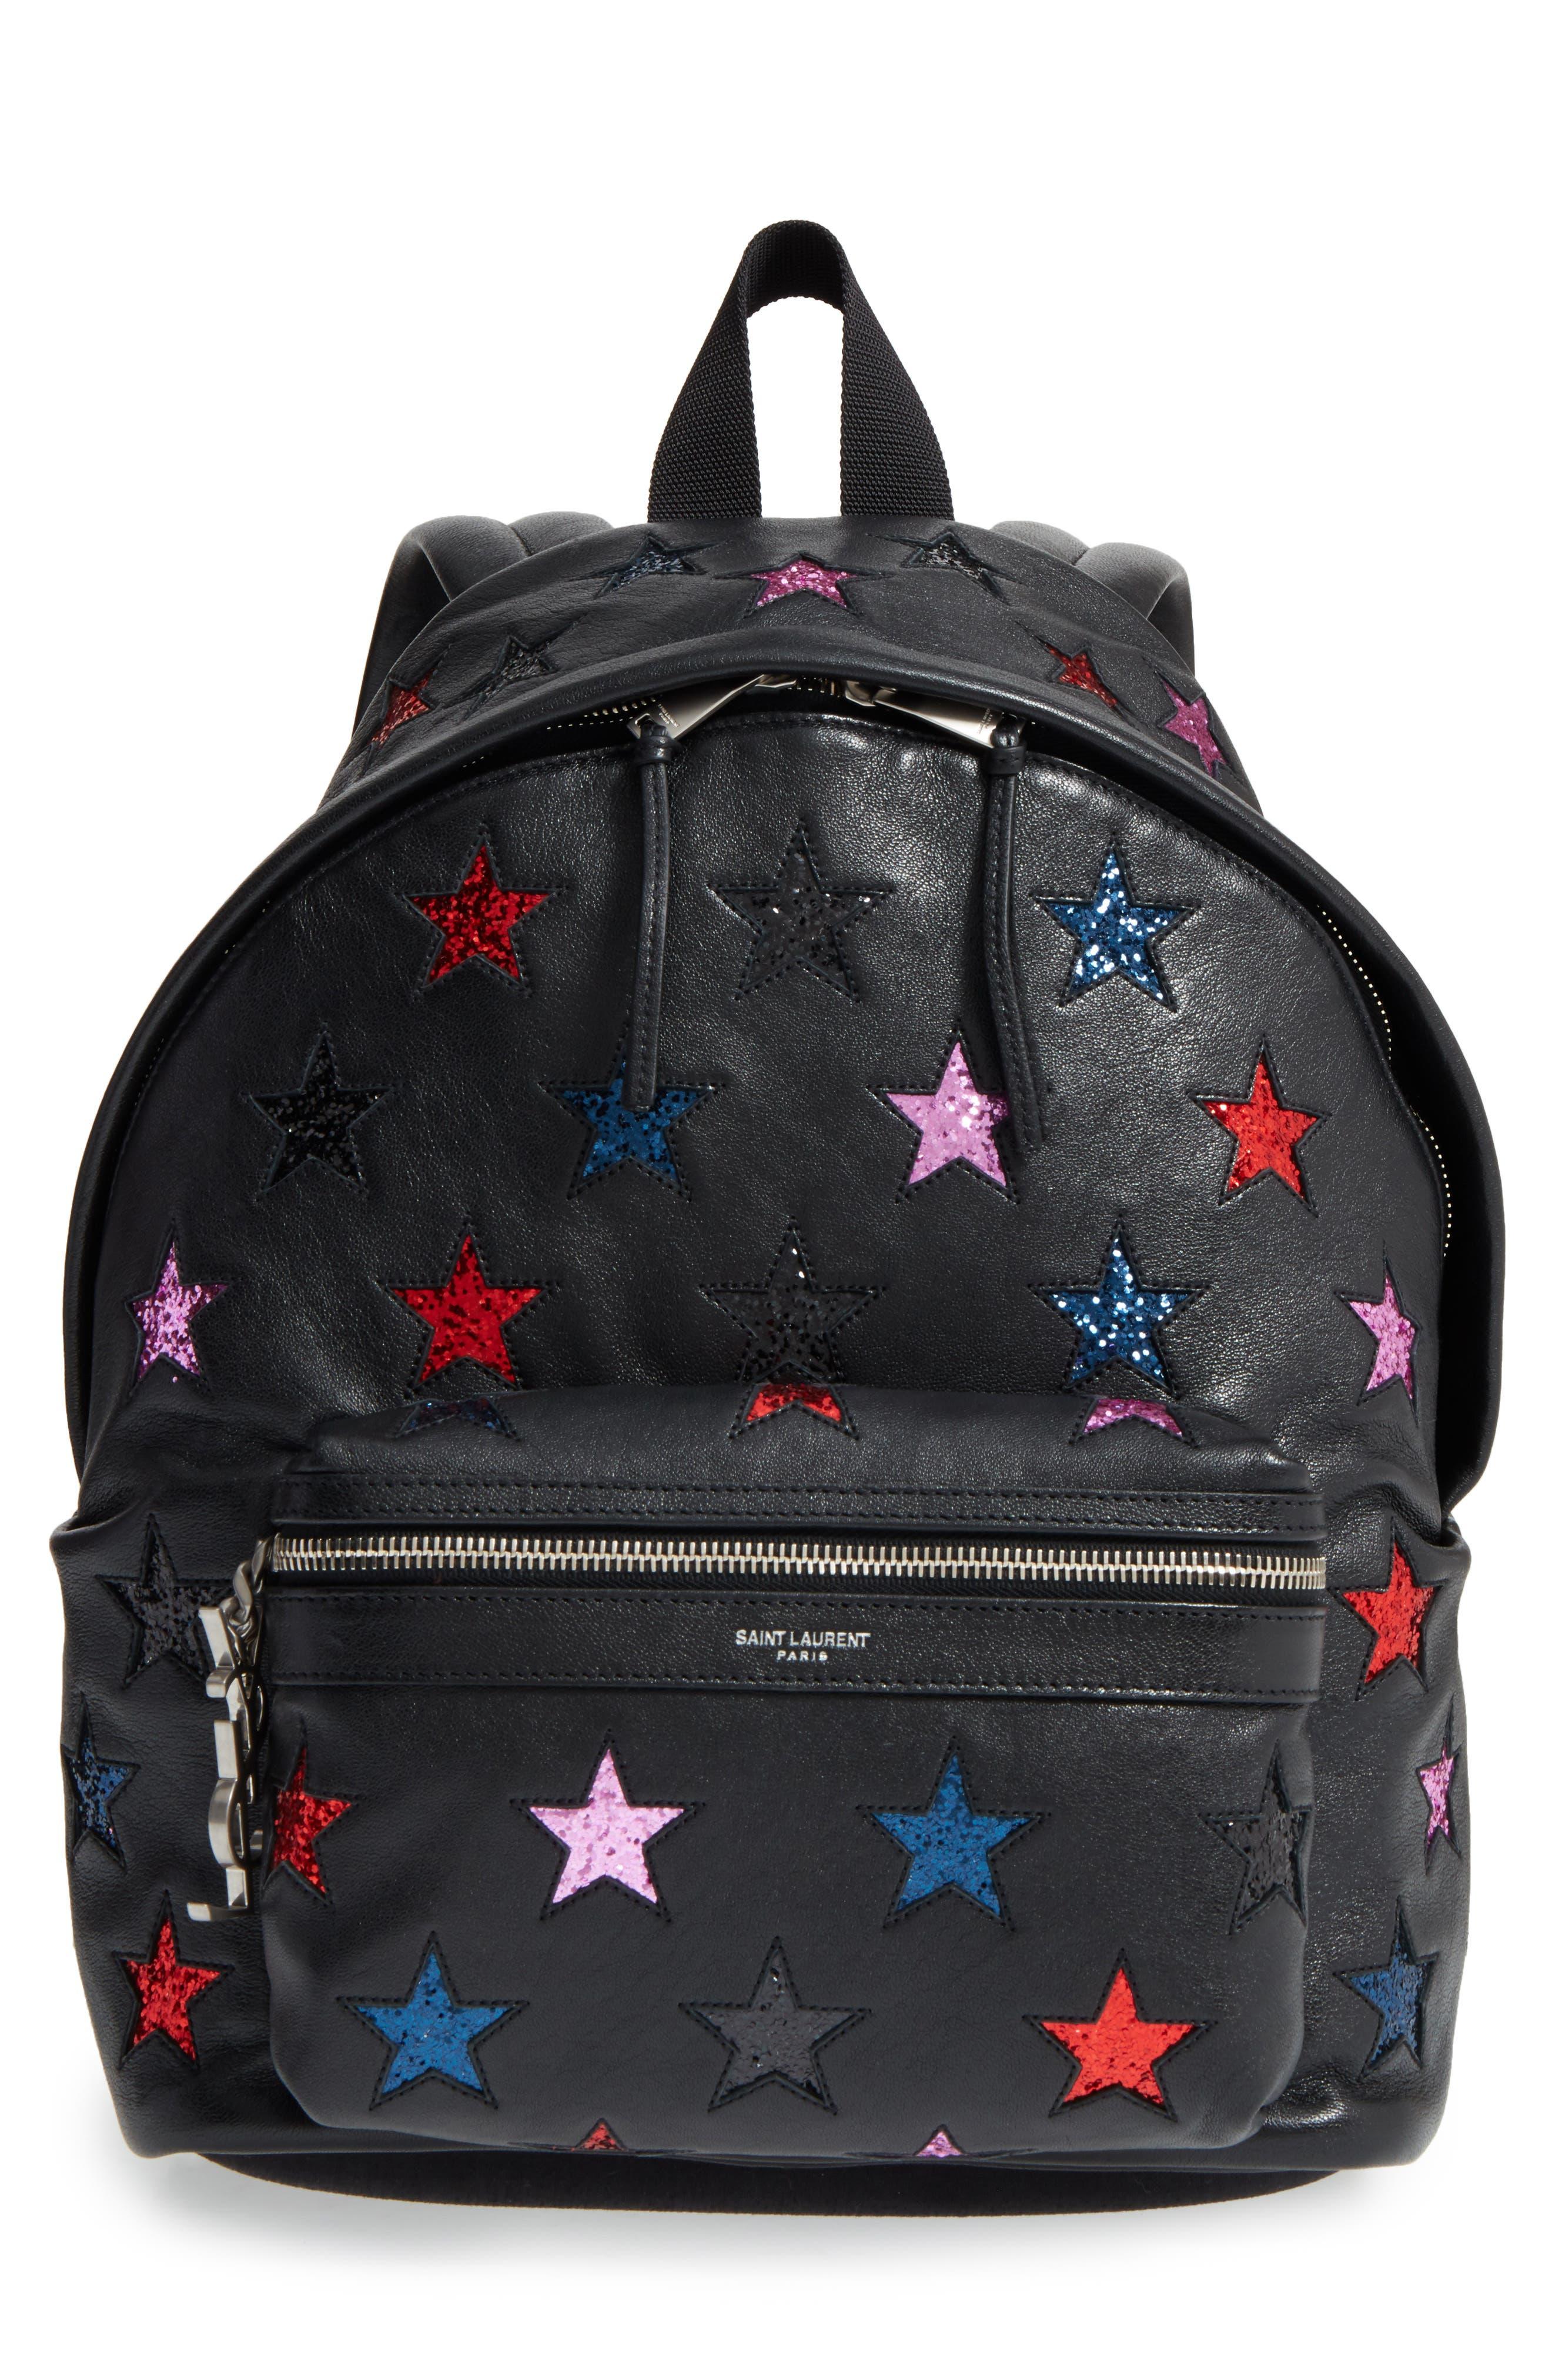 Alternate Image 1 Selected - Saint Laurent Mini City California Star Leather Backpack